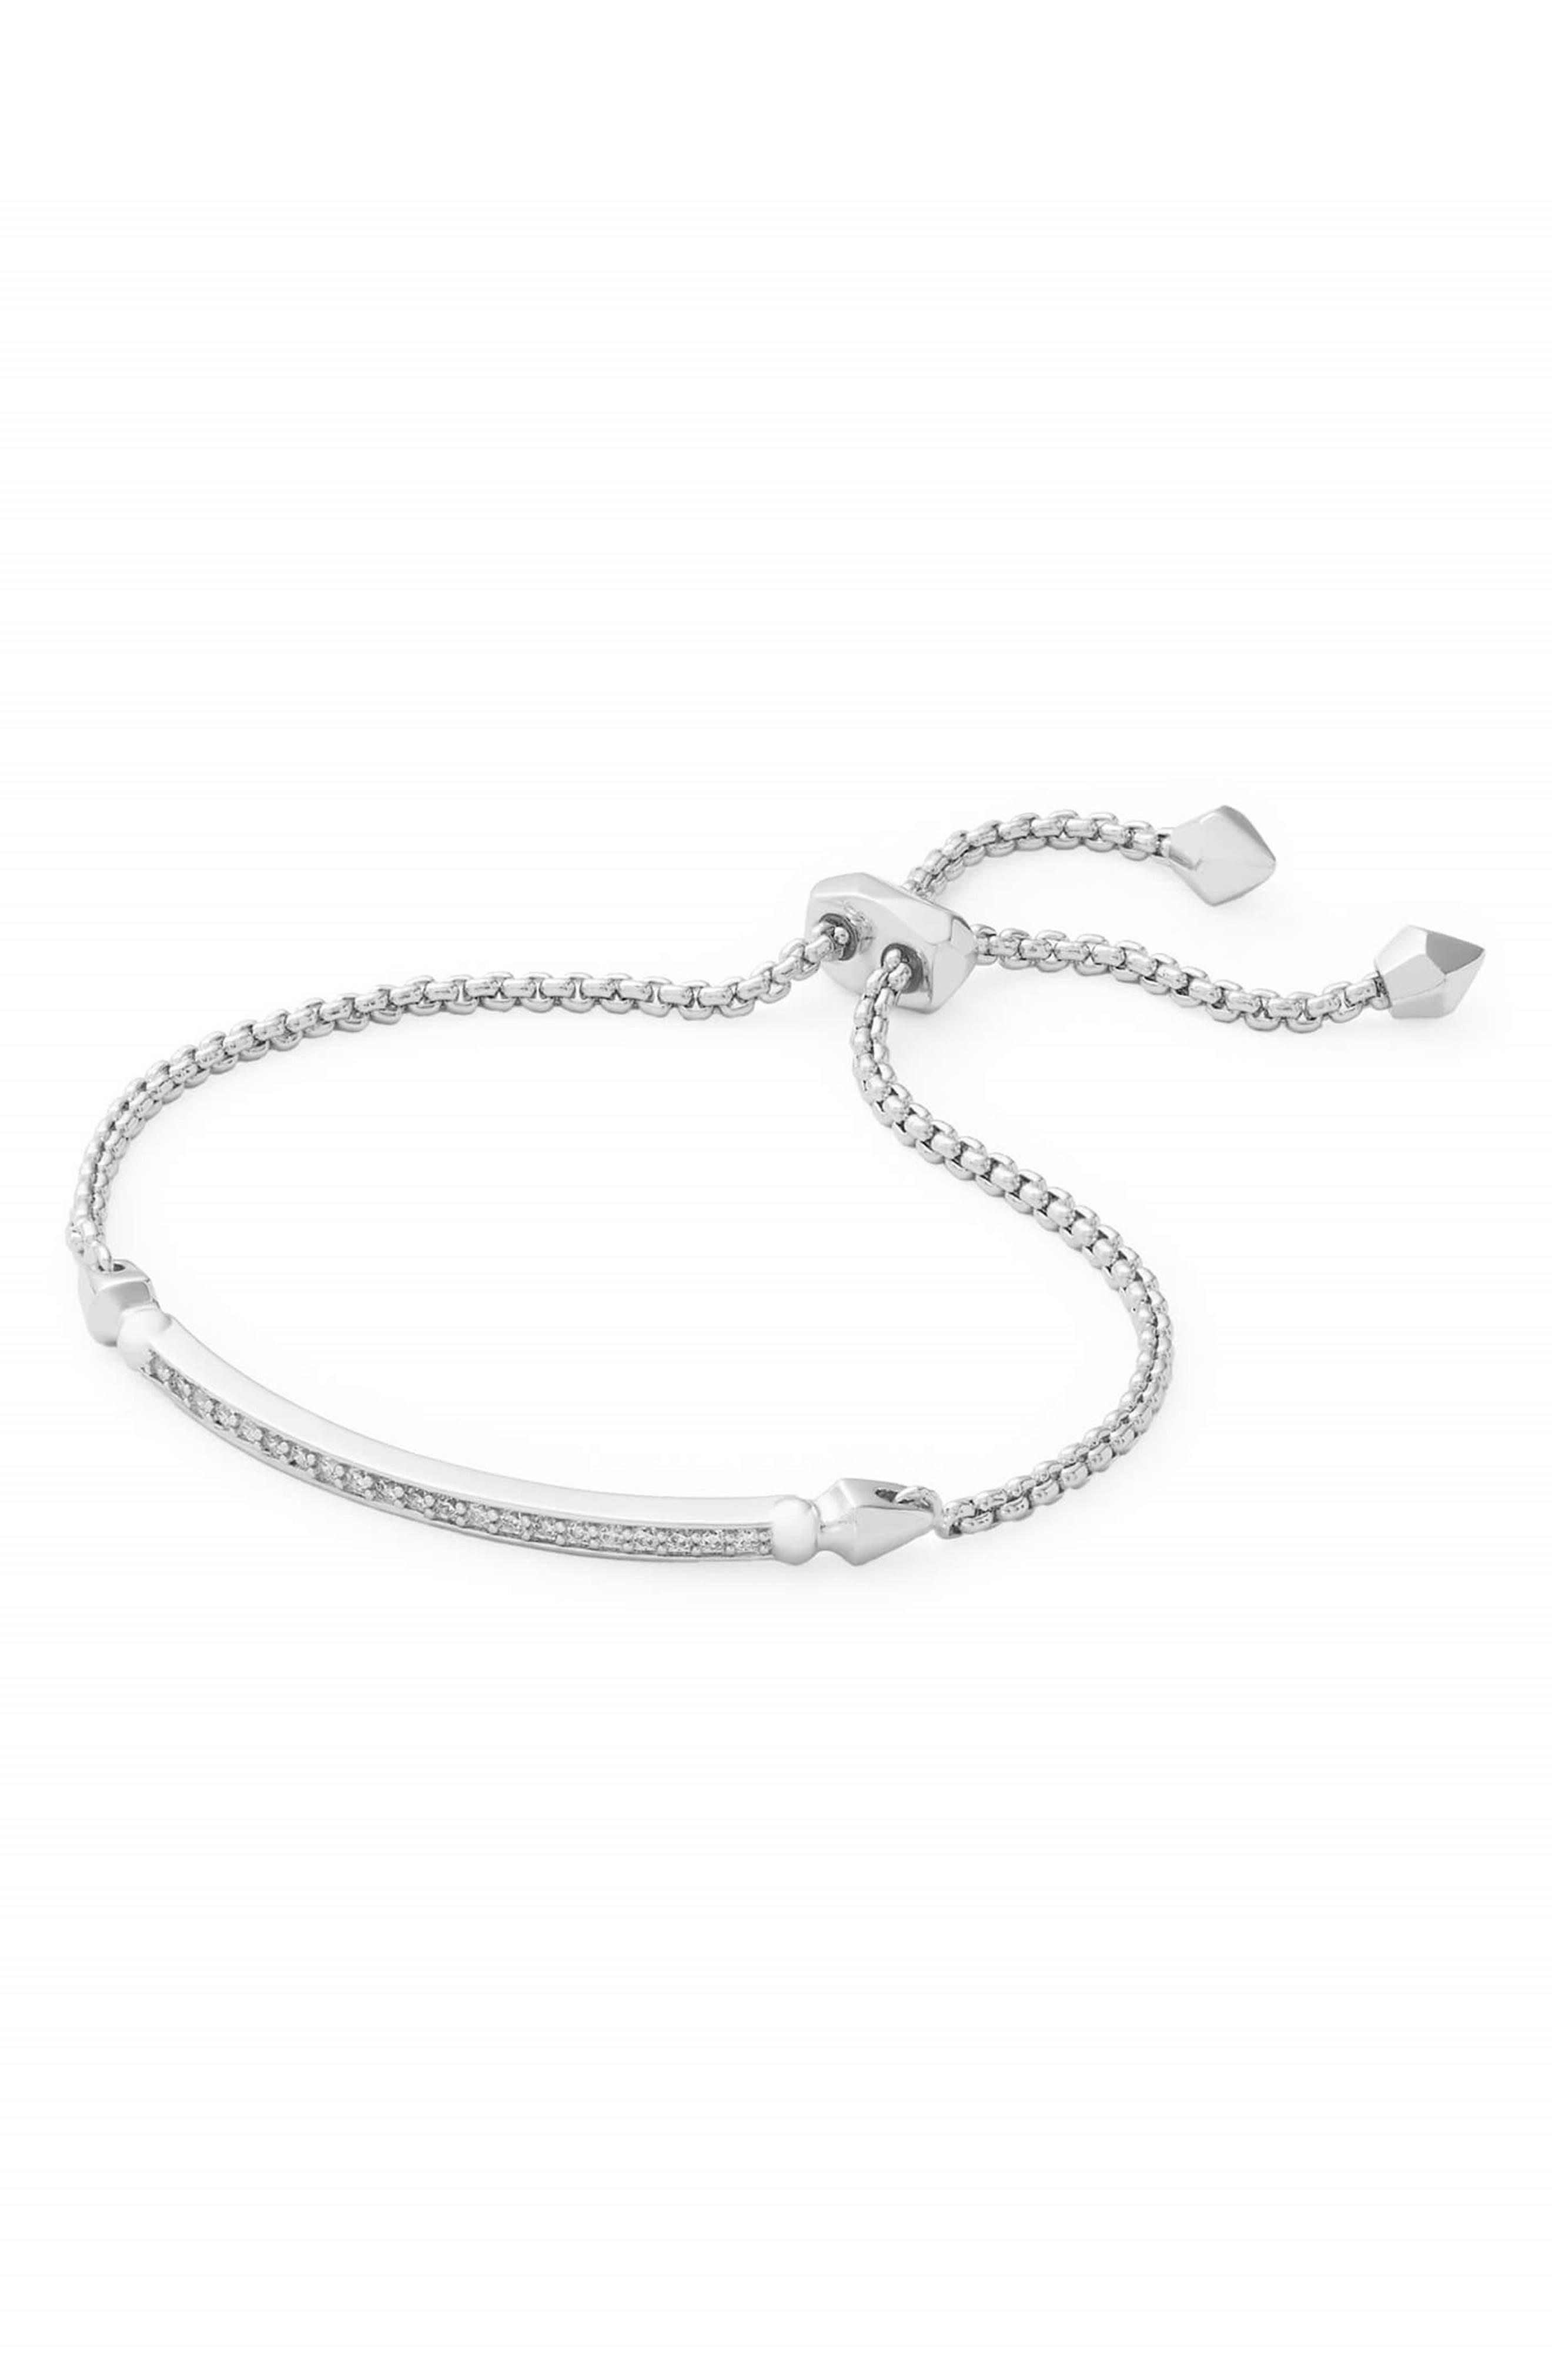 Ott Friendship Bracelet,                         Main,                         color, SILVER